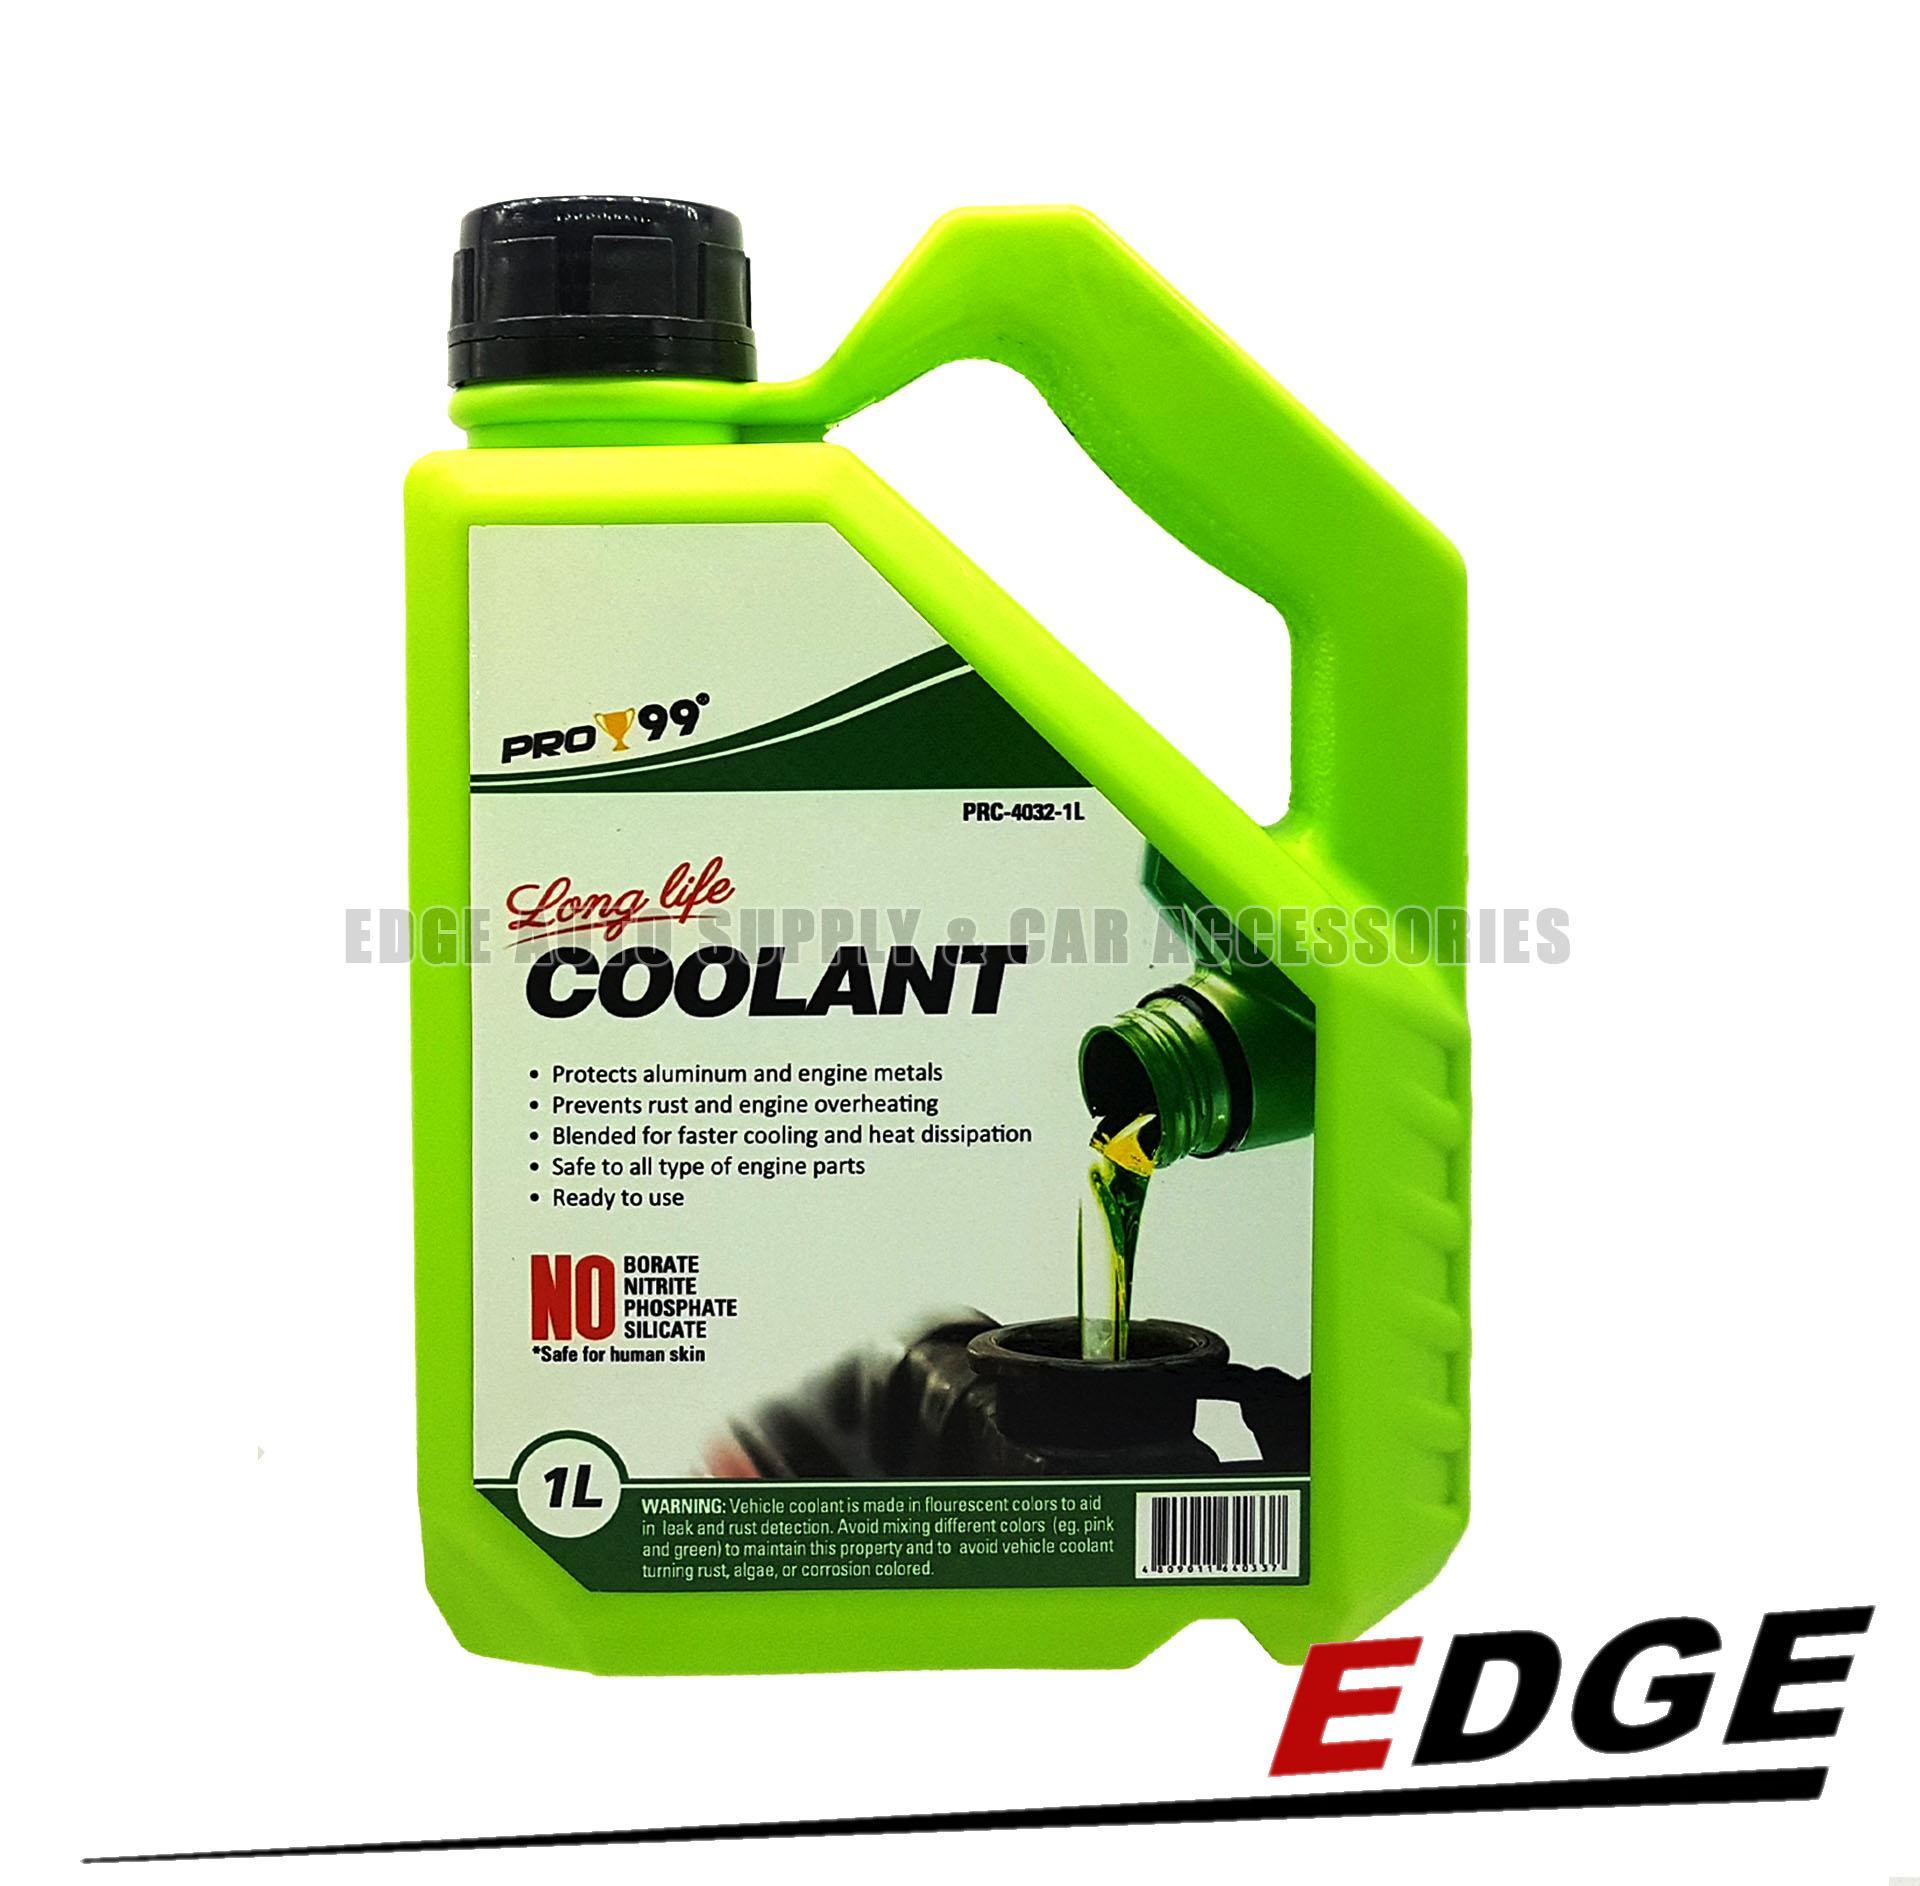 Antifreeze For Sale Radiator Coolants Online Brands Prices Prestone Engine Coolant Pro99 Green 1l Pro 99 Long